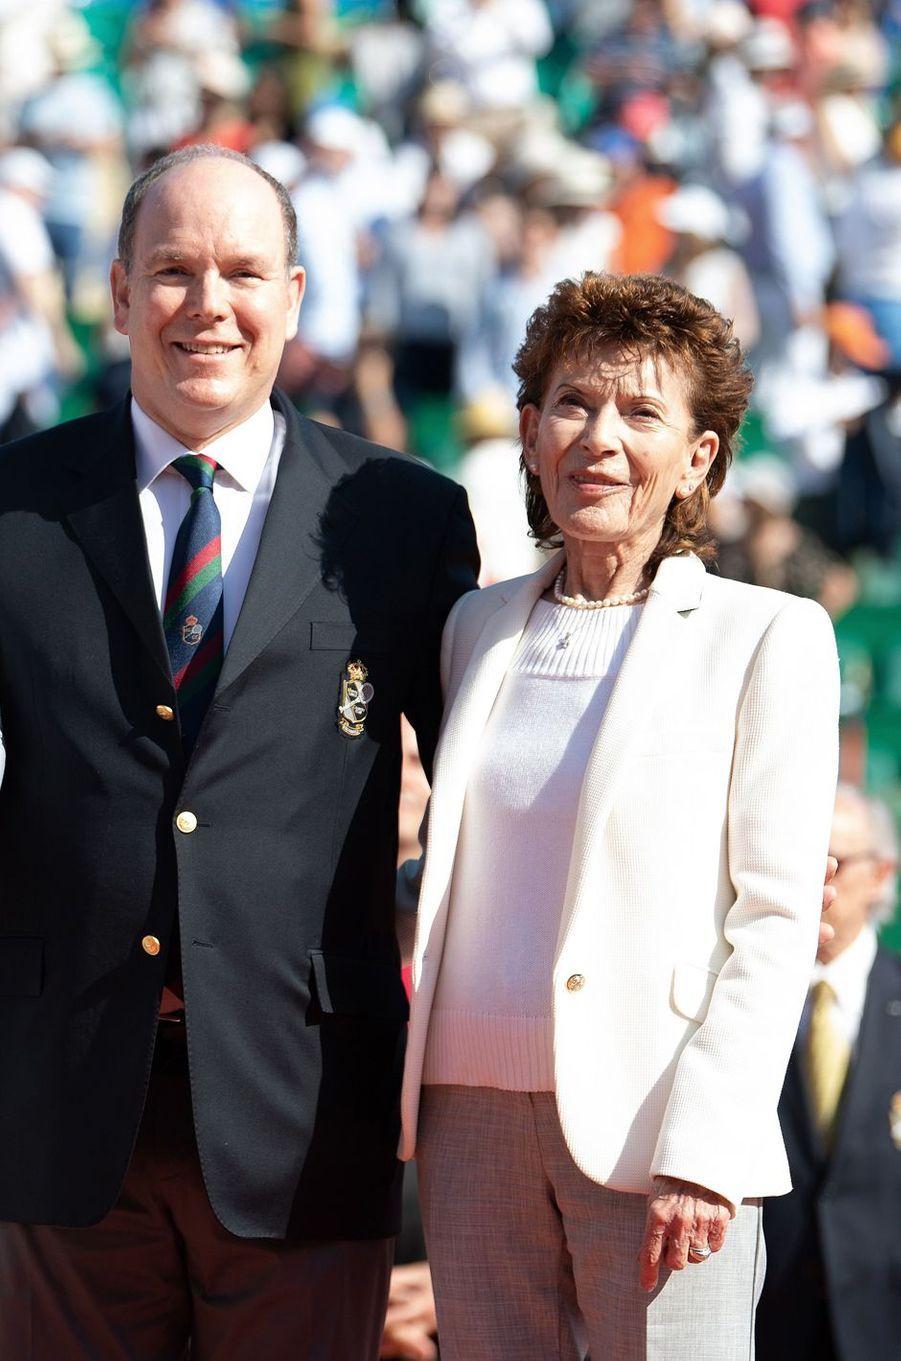 La baronne Elizabeth-Ann de Massy, avec le prince Albert II de Monaco, le 22 avril 2018